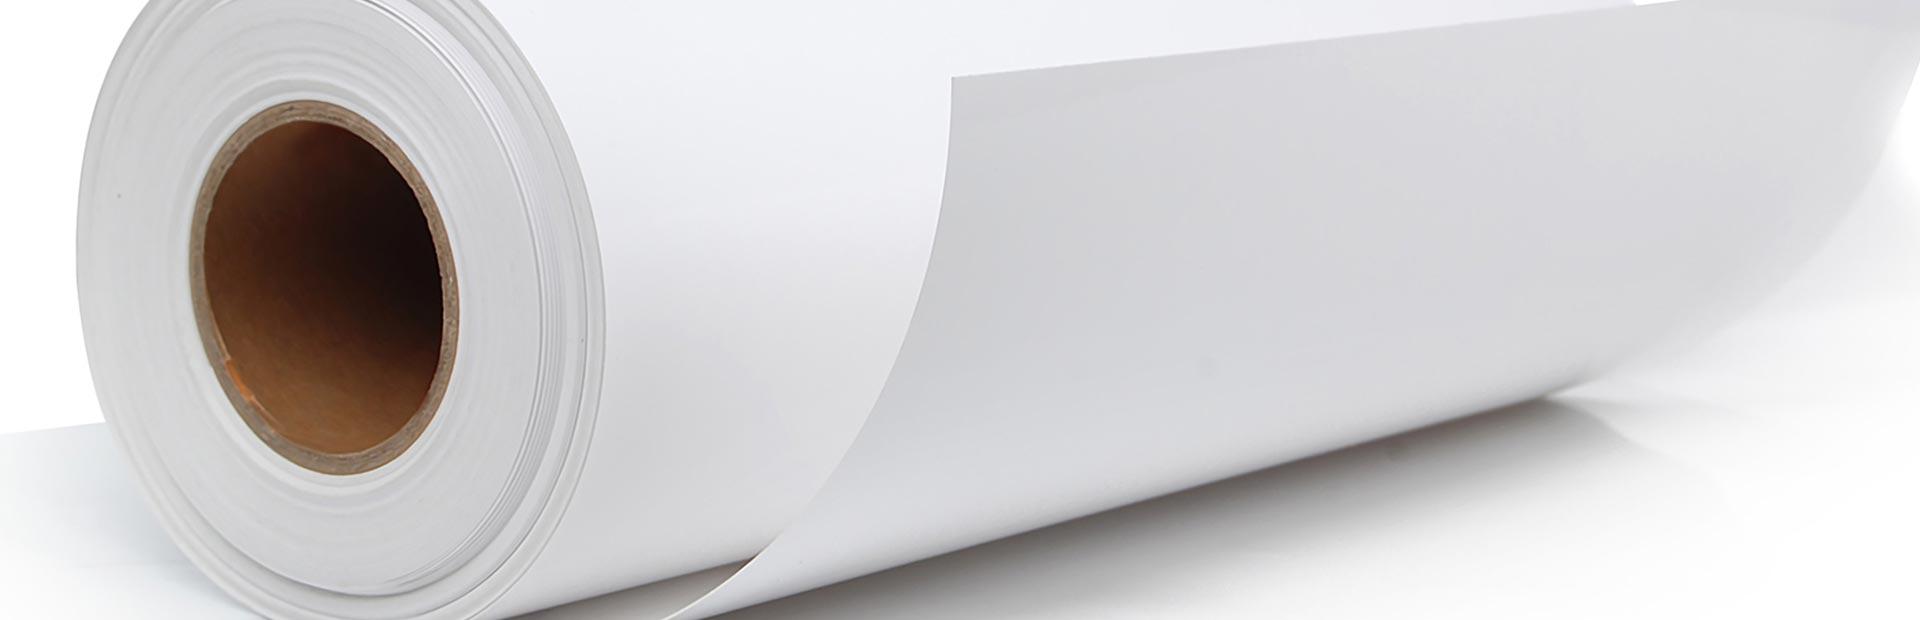 xhomebanner-paper-roll